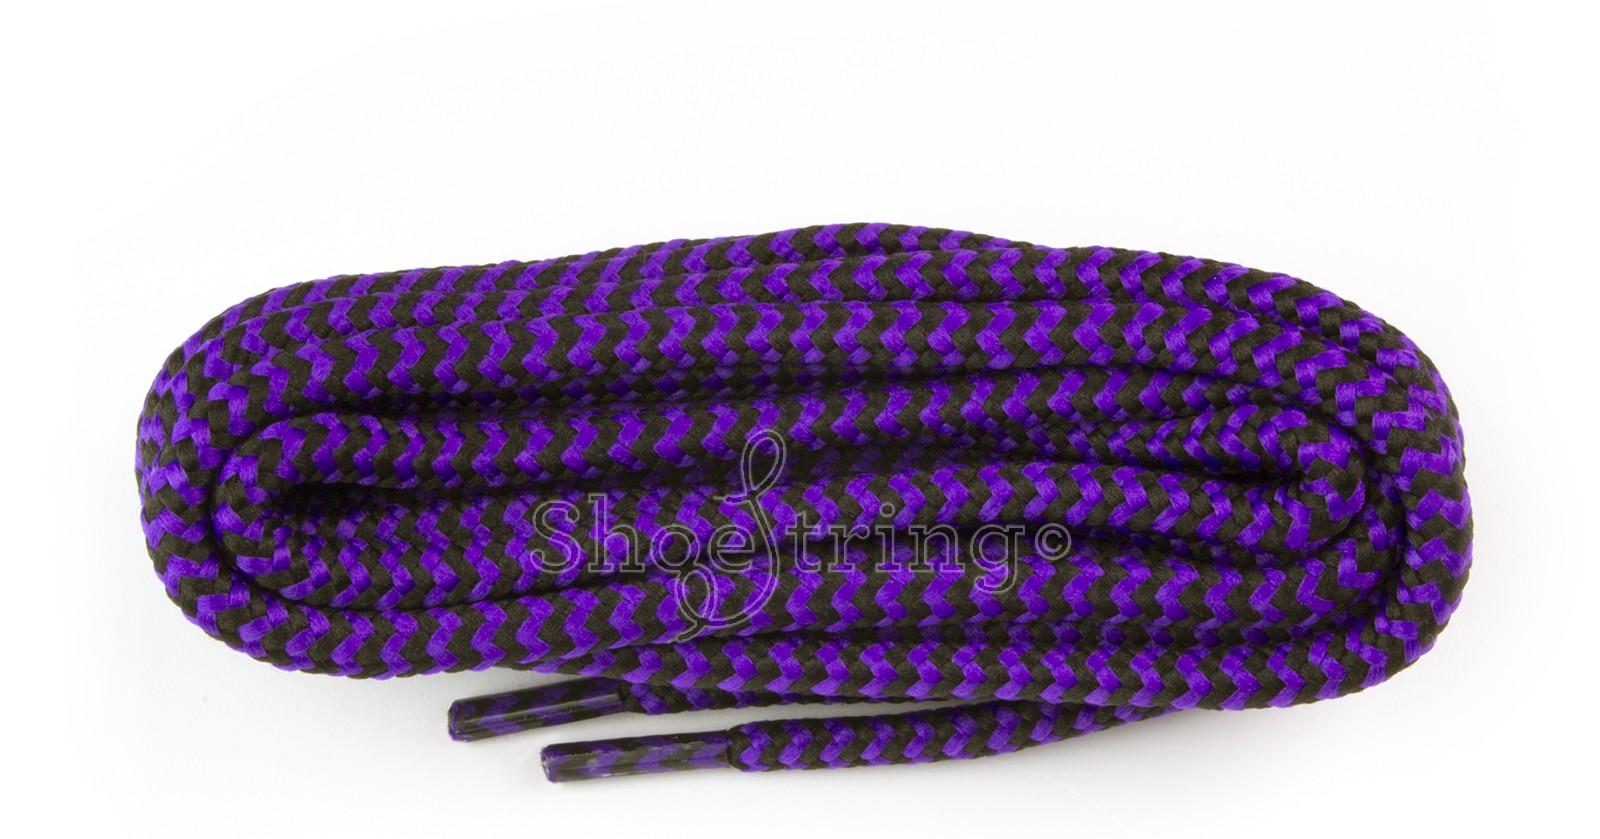 Hiking 150cm Purple/black Dog-tooth